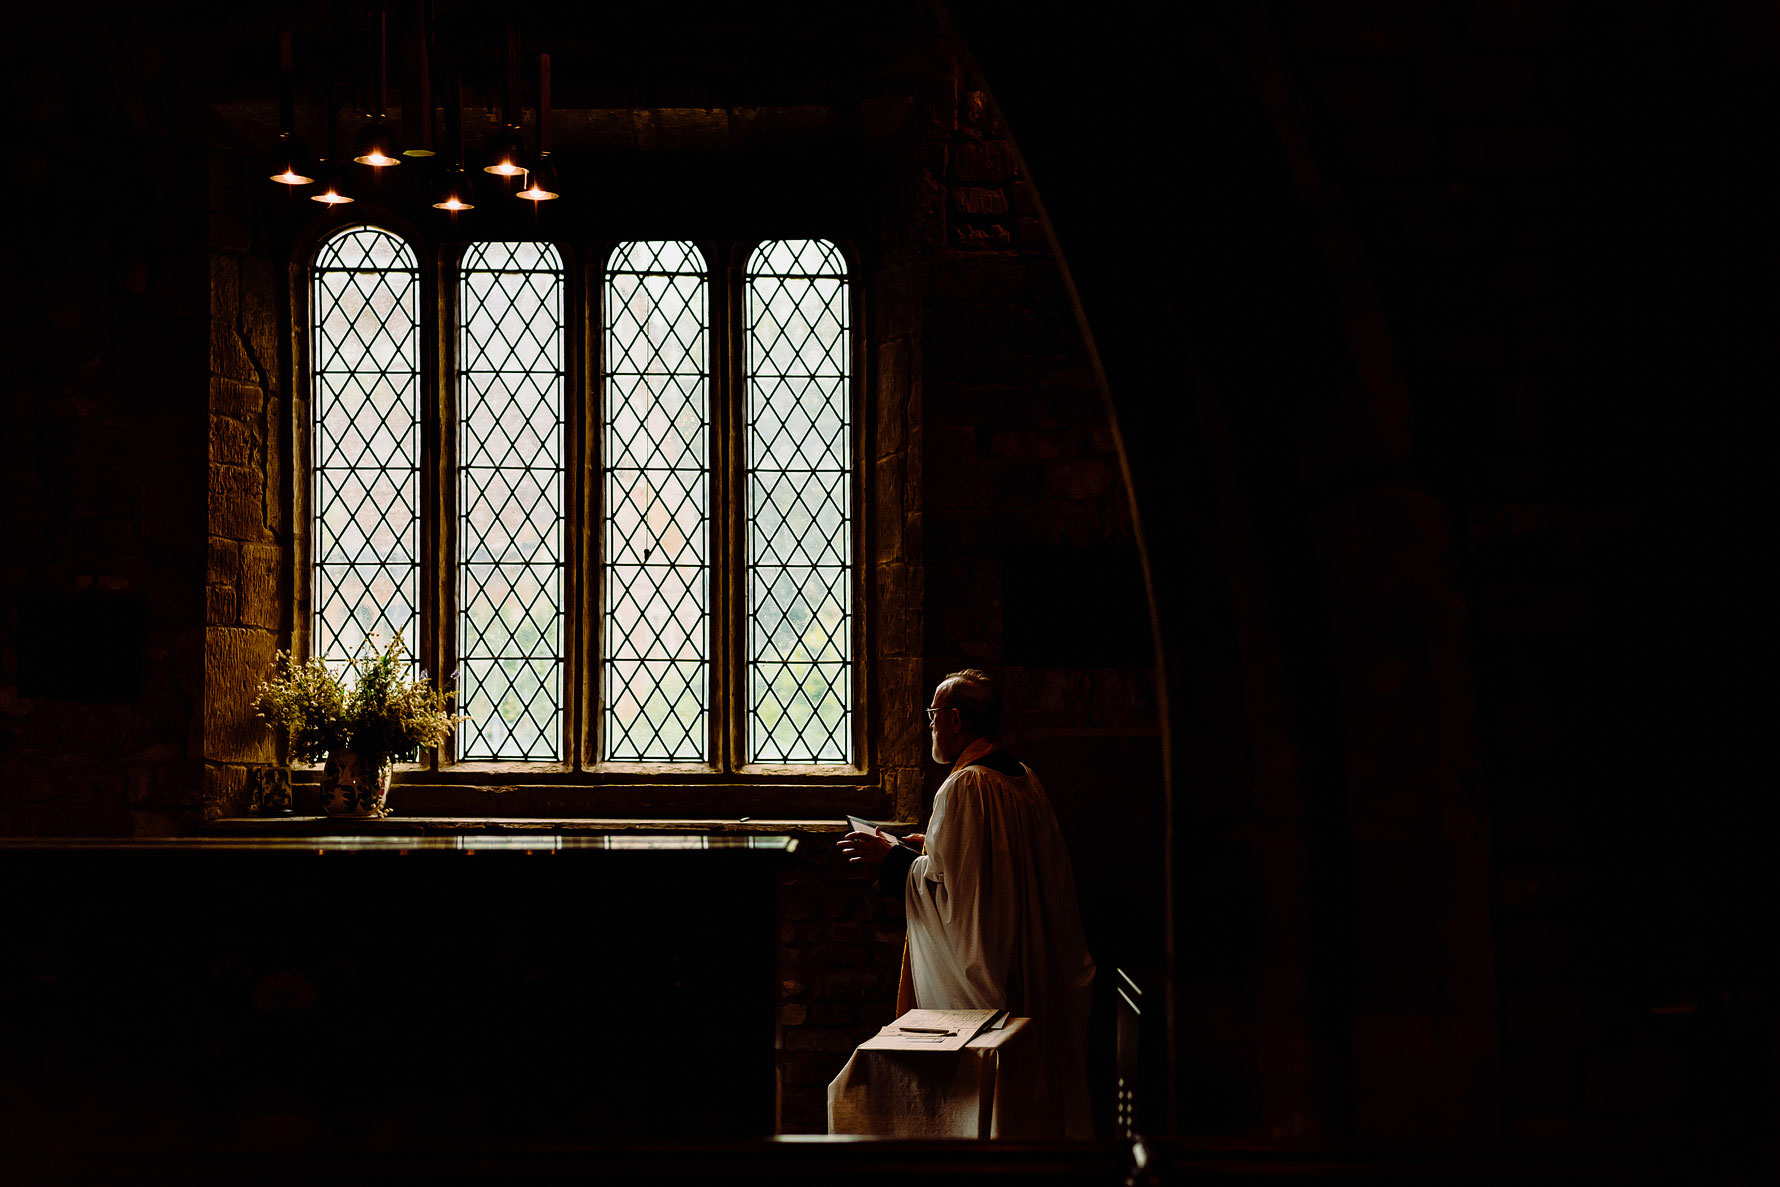 an artistic photograph of a vicar